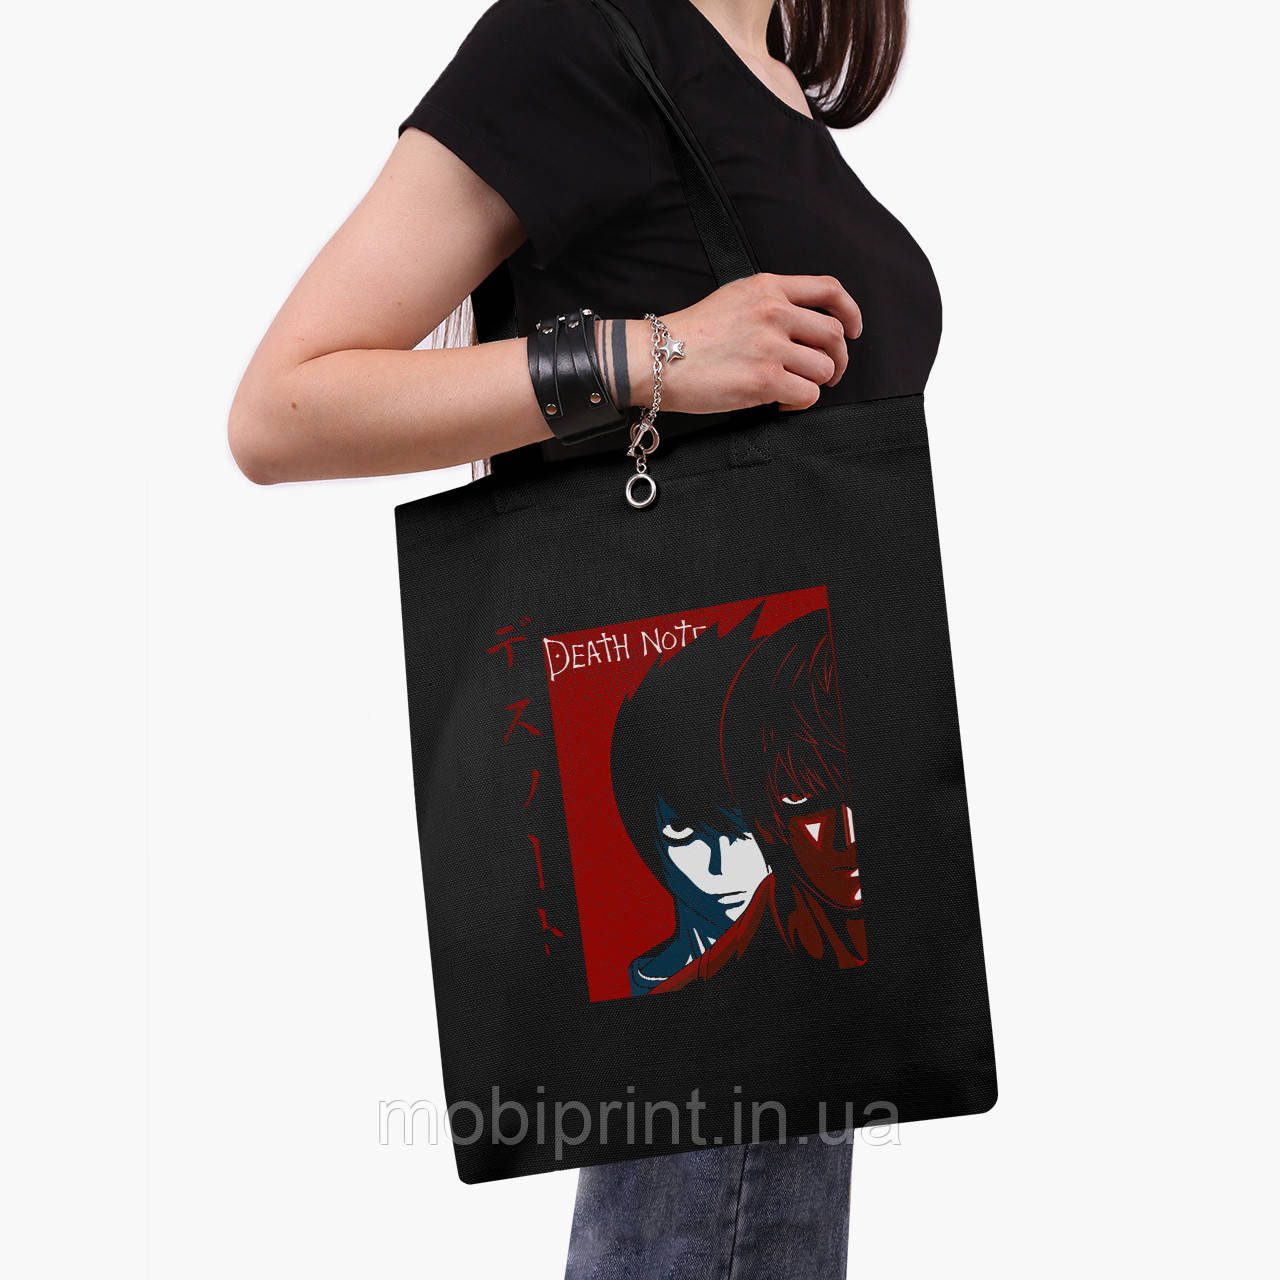 Еко сумка шоппер чорна Ел і Кіра Зошит смерті (Death Note) (9227-2655-2) 41*35 см